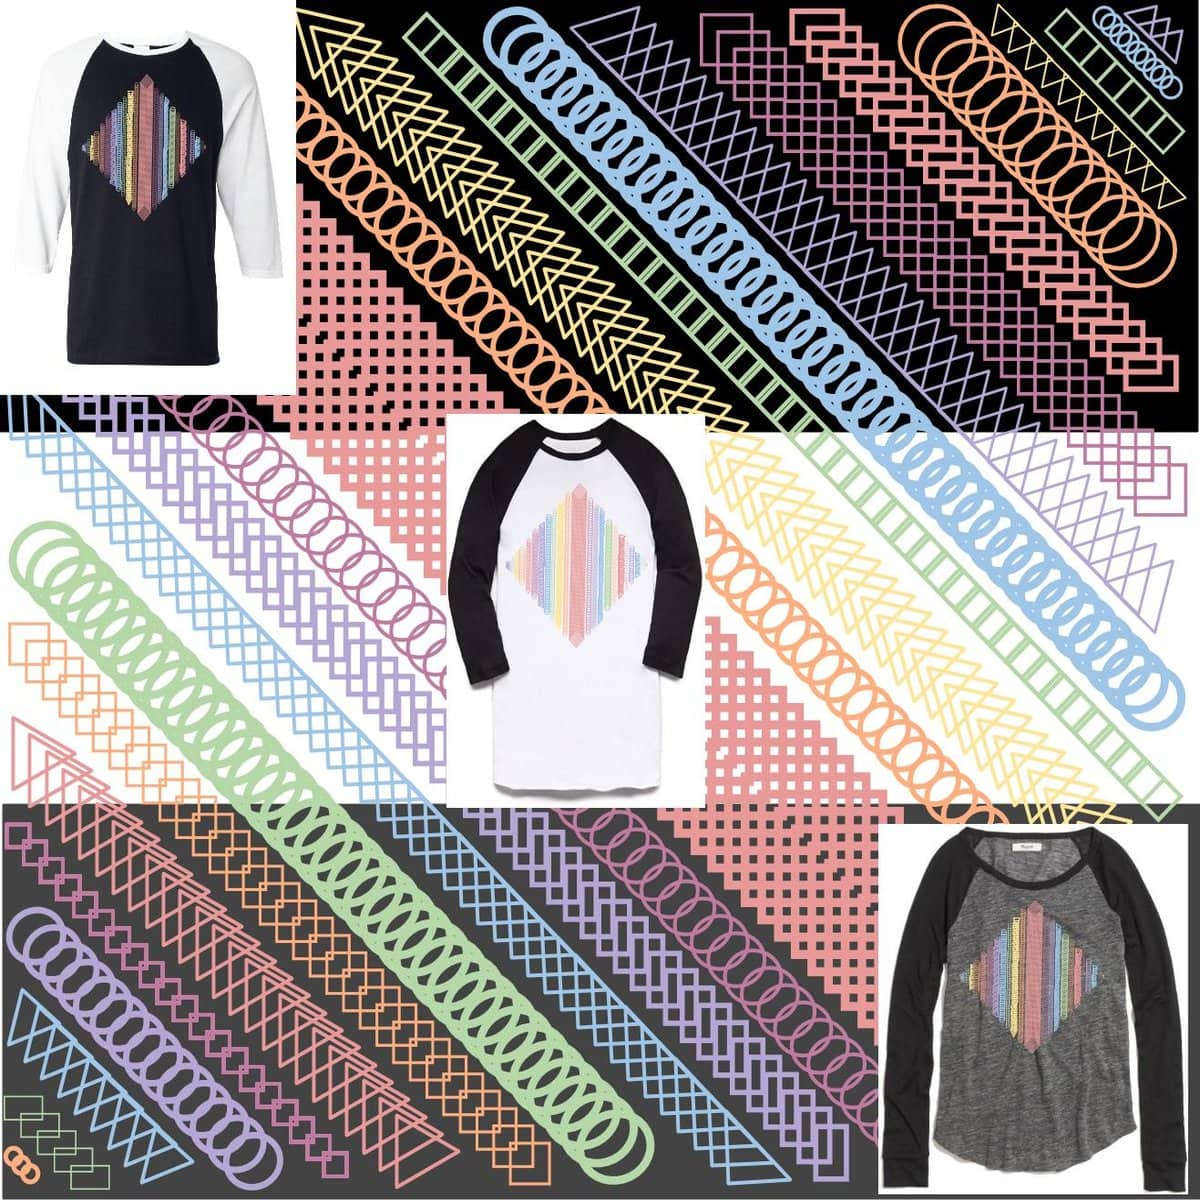 Rainbow Shapes by OzoneZoe on Threadless